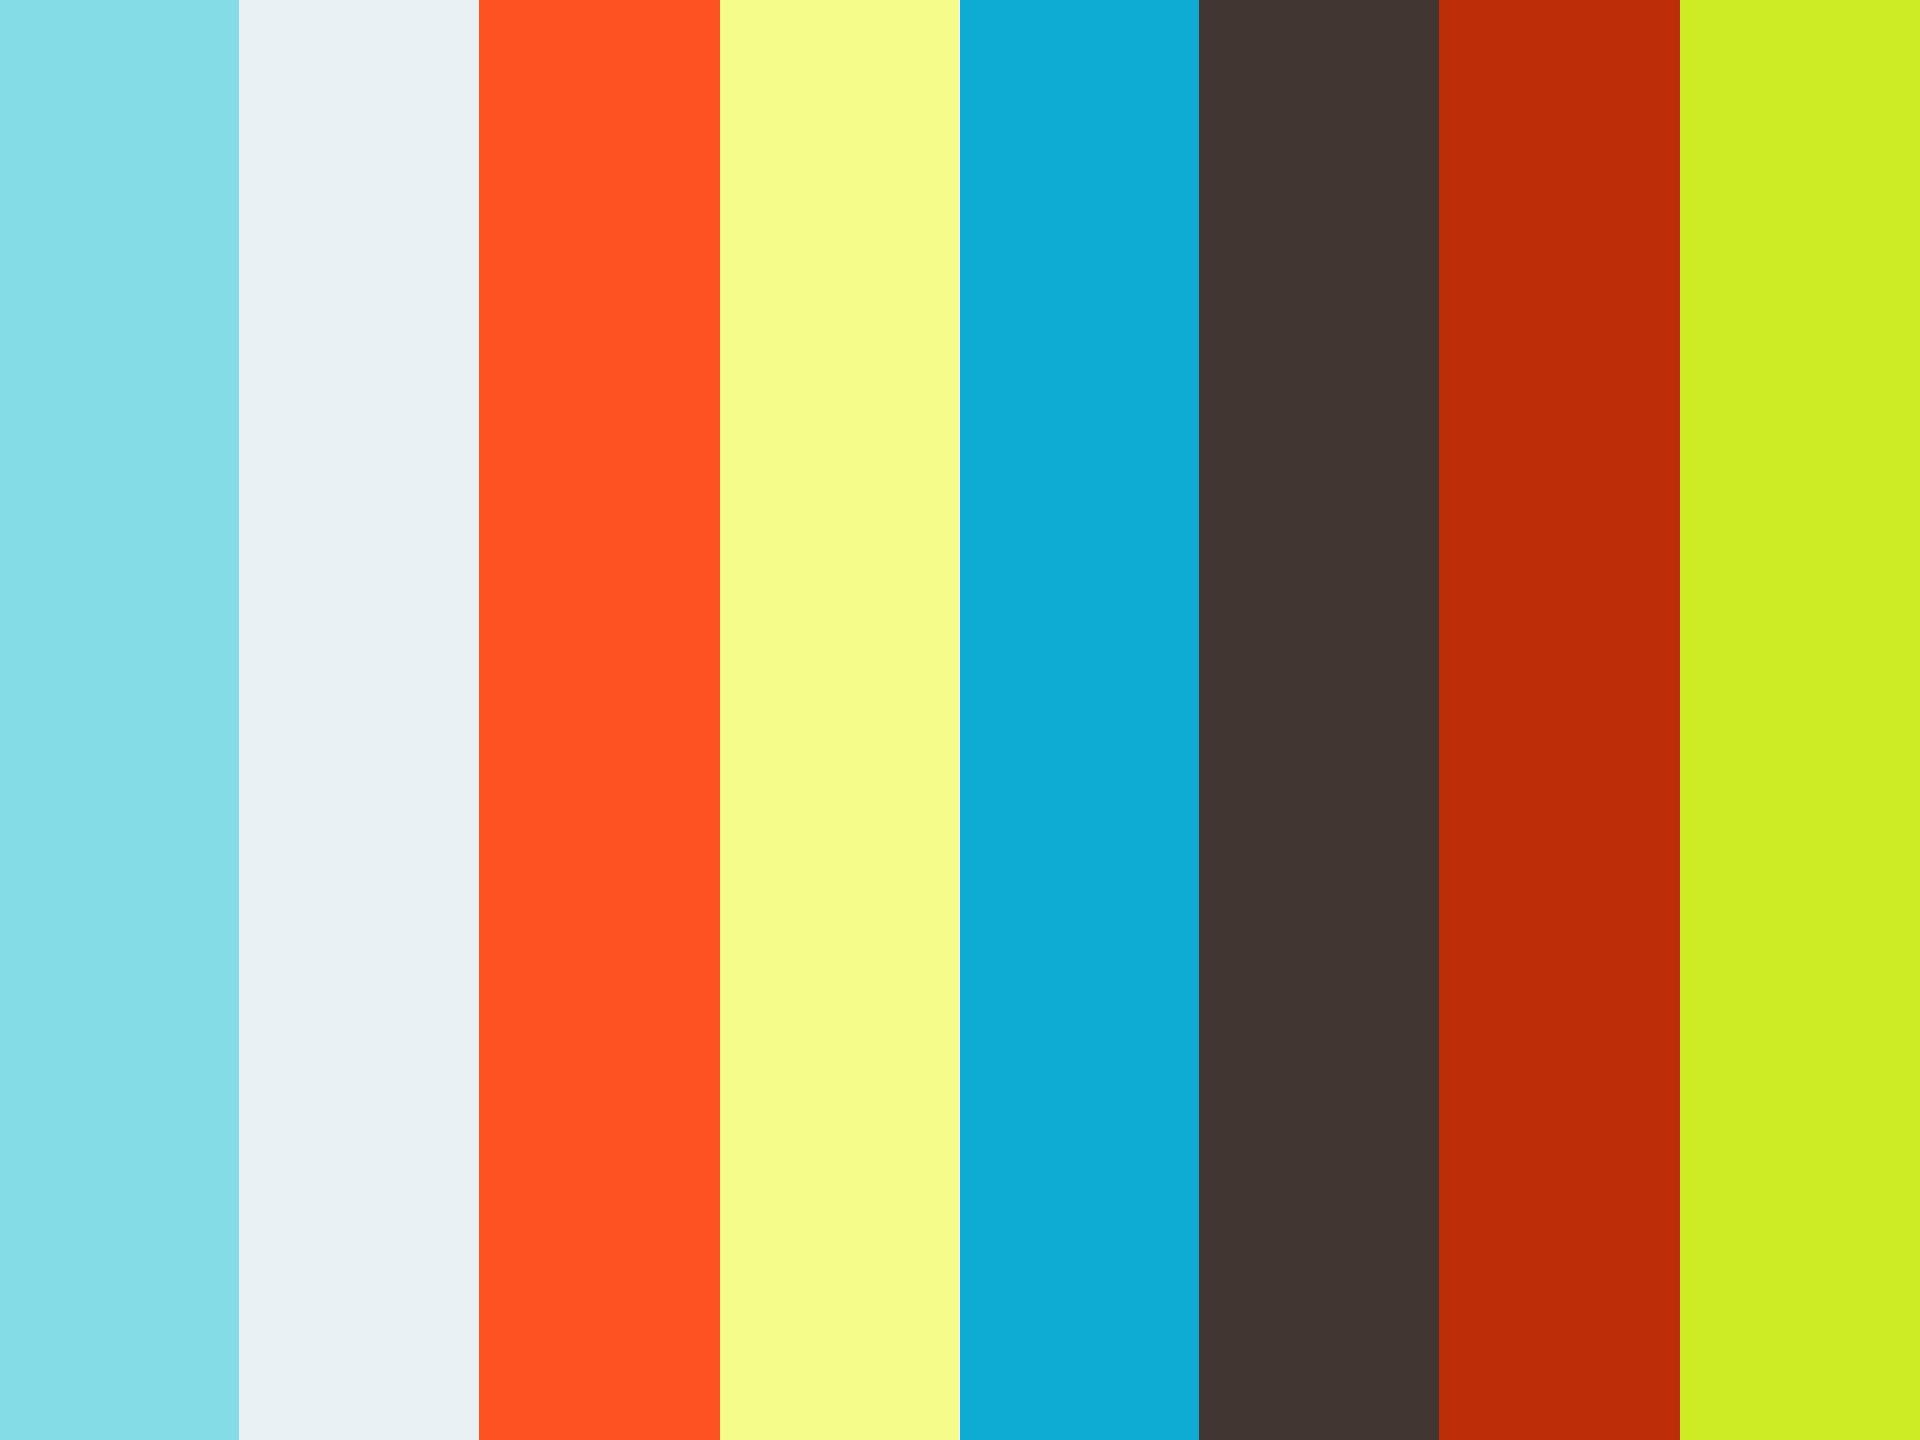 Rainbow ink splat myspace theme